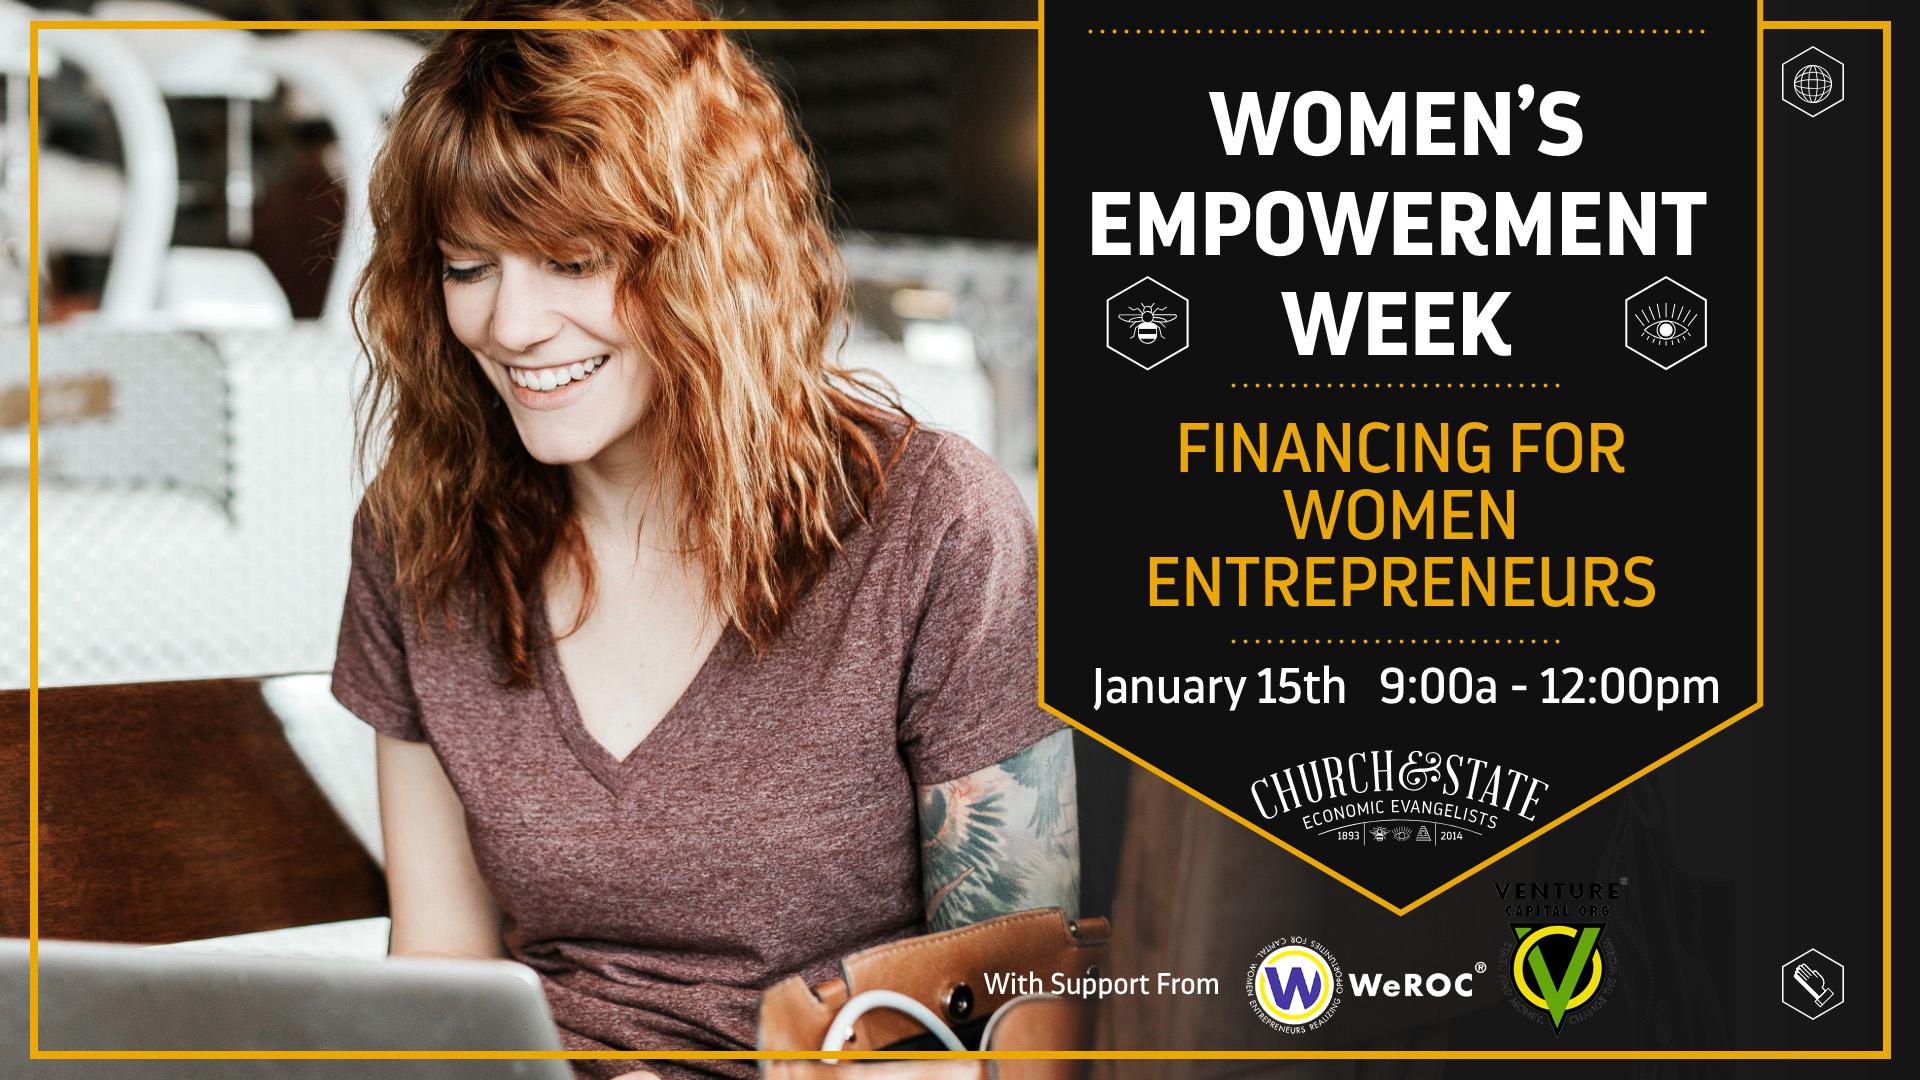 Women's Empowerment Week: Financing for Women Entrepreneurs